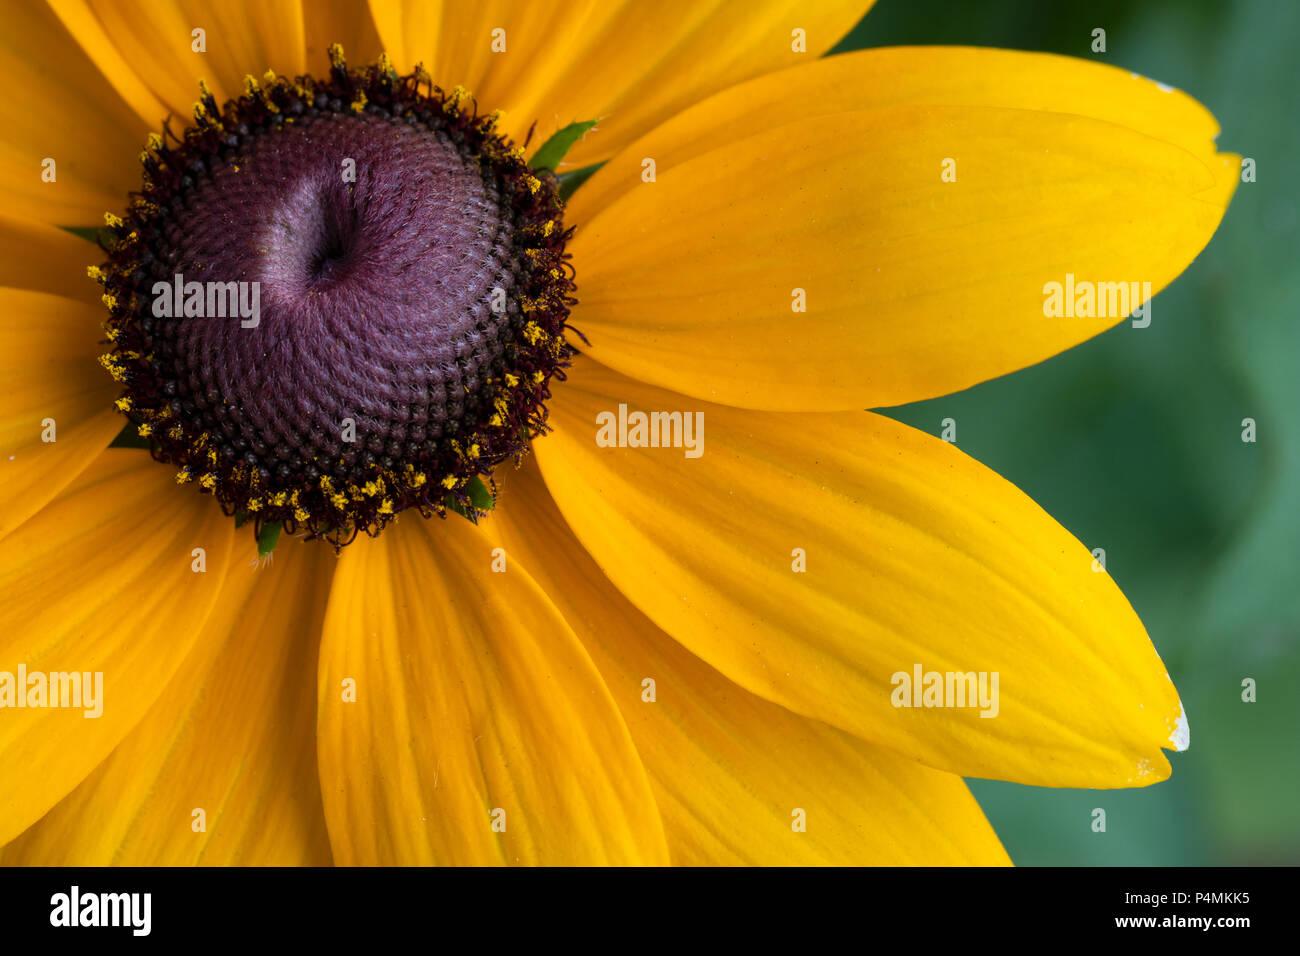 Close-up of a yellow Rudbeckia fulgida flower - Stock Image